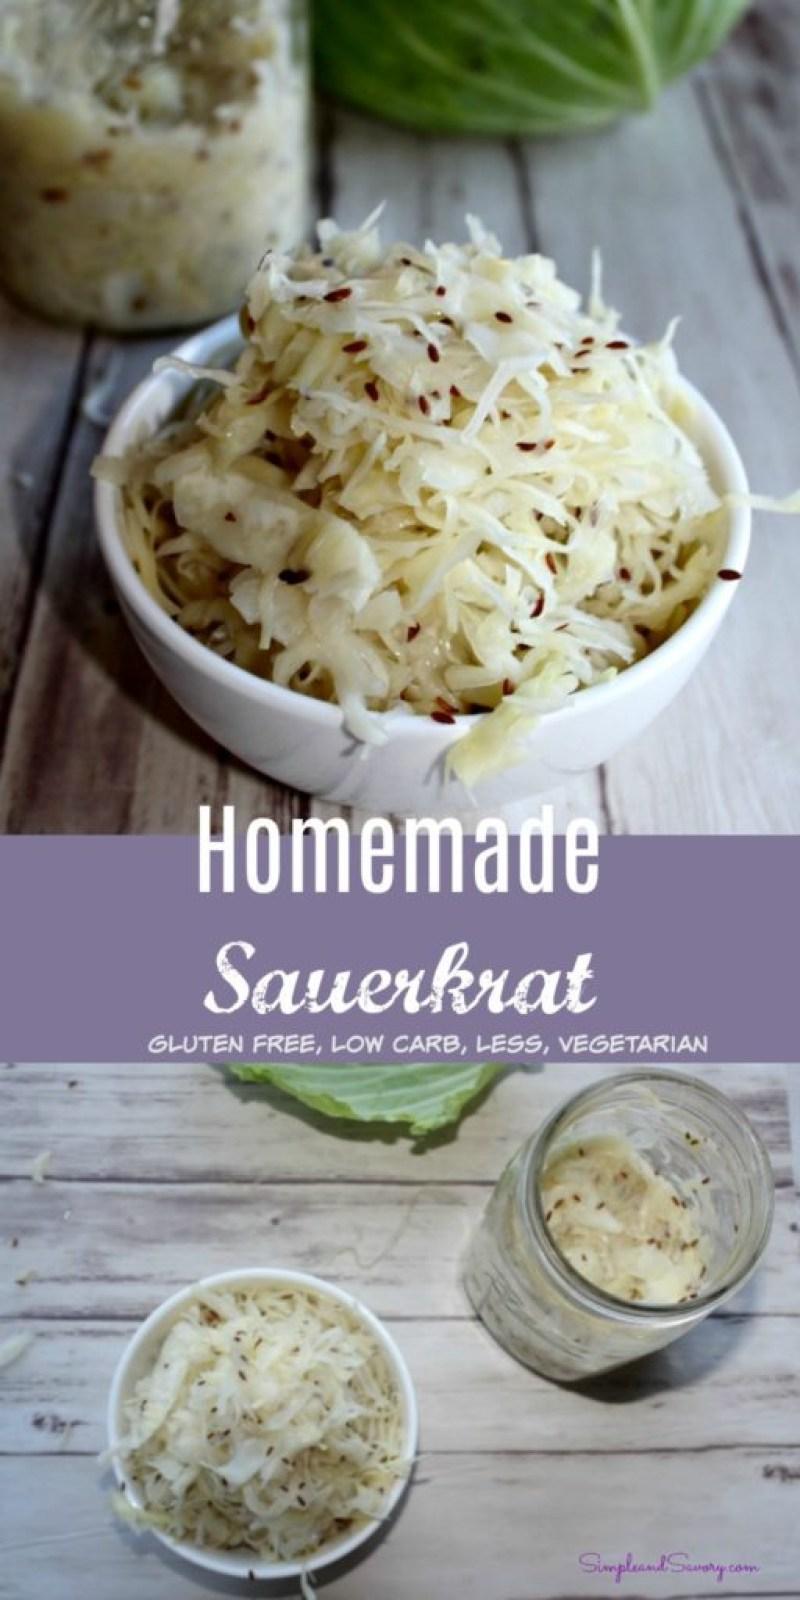 Homemade Sauerkraut Vegetarian gluten free